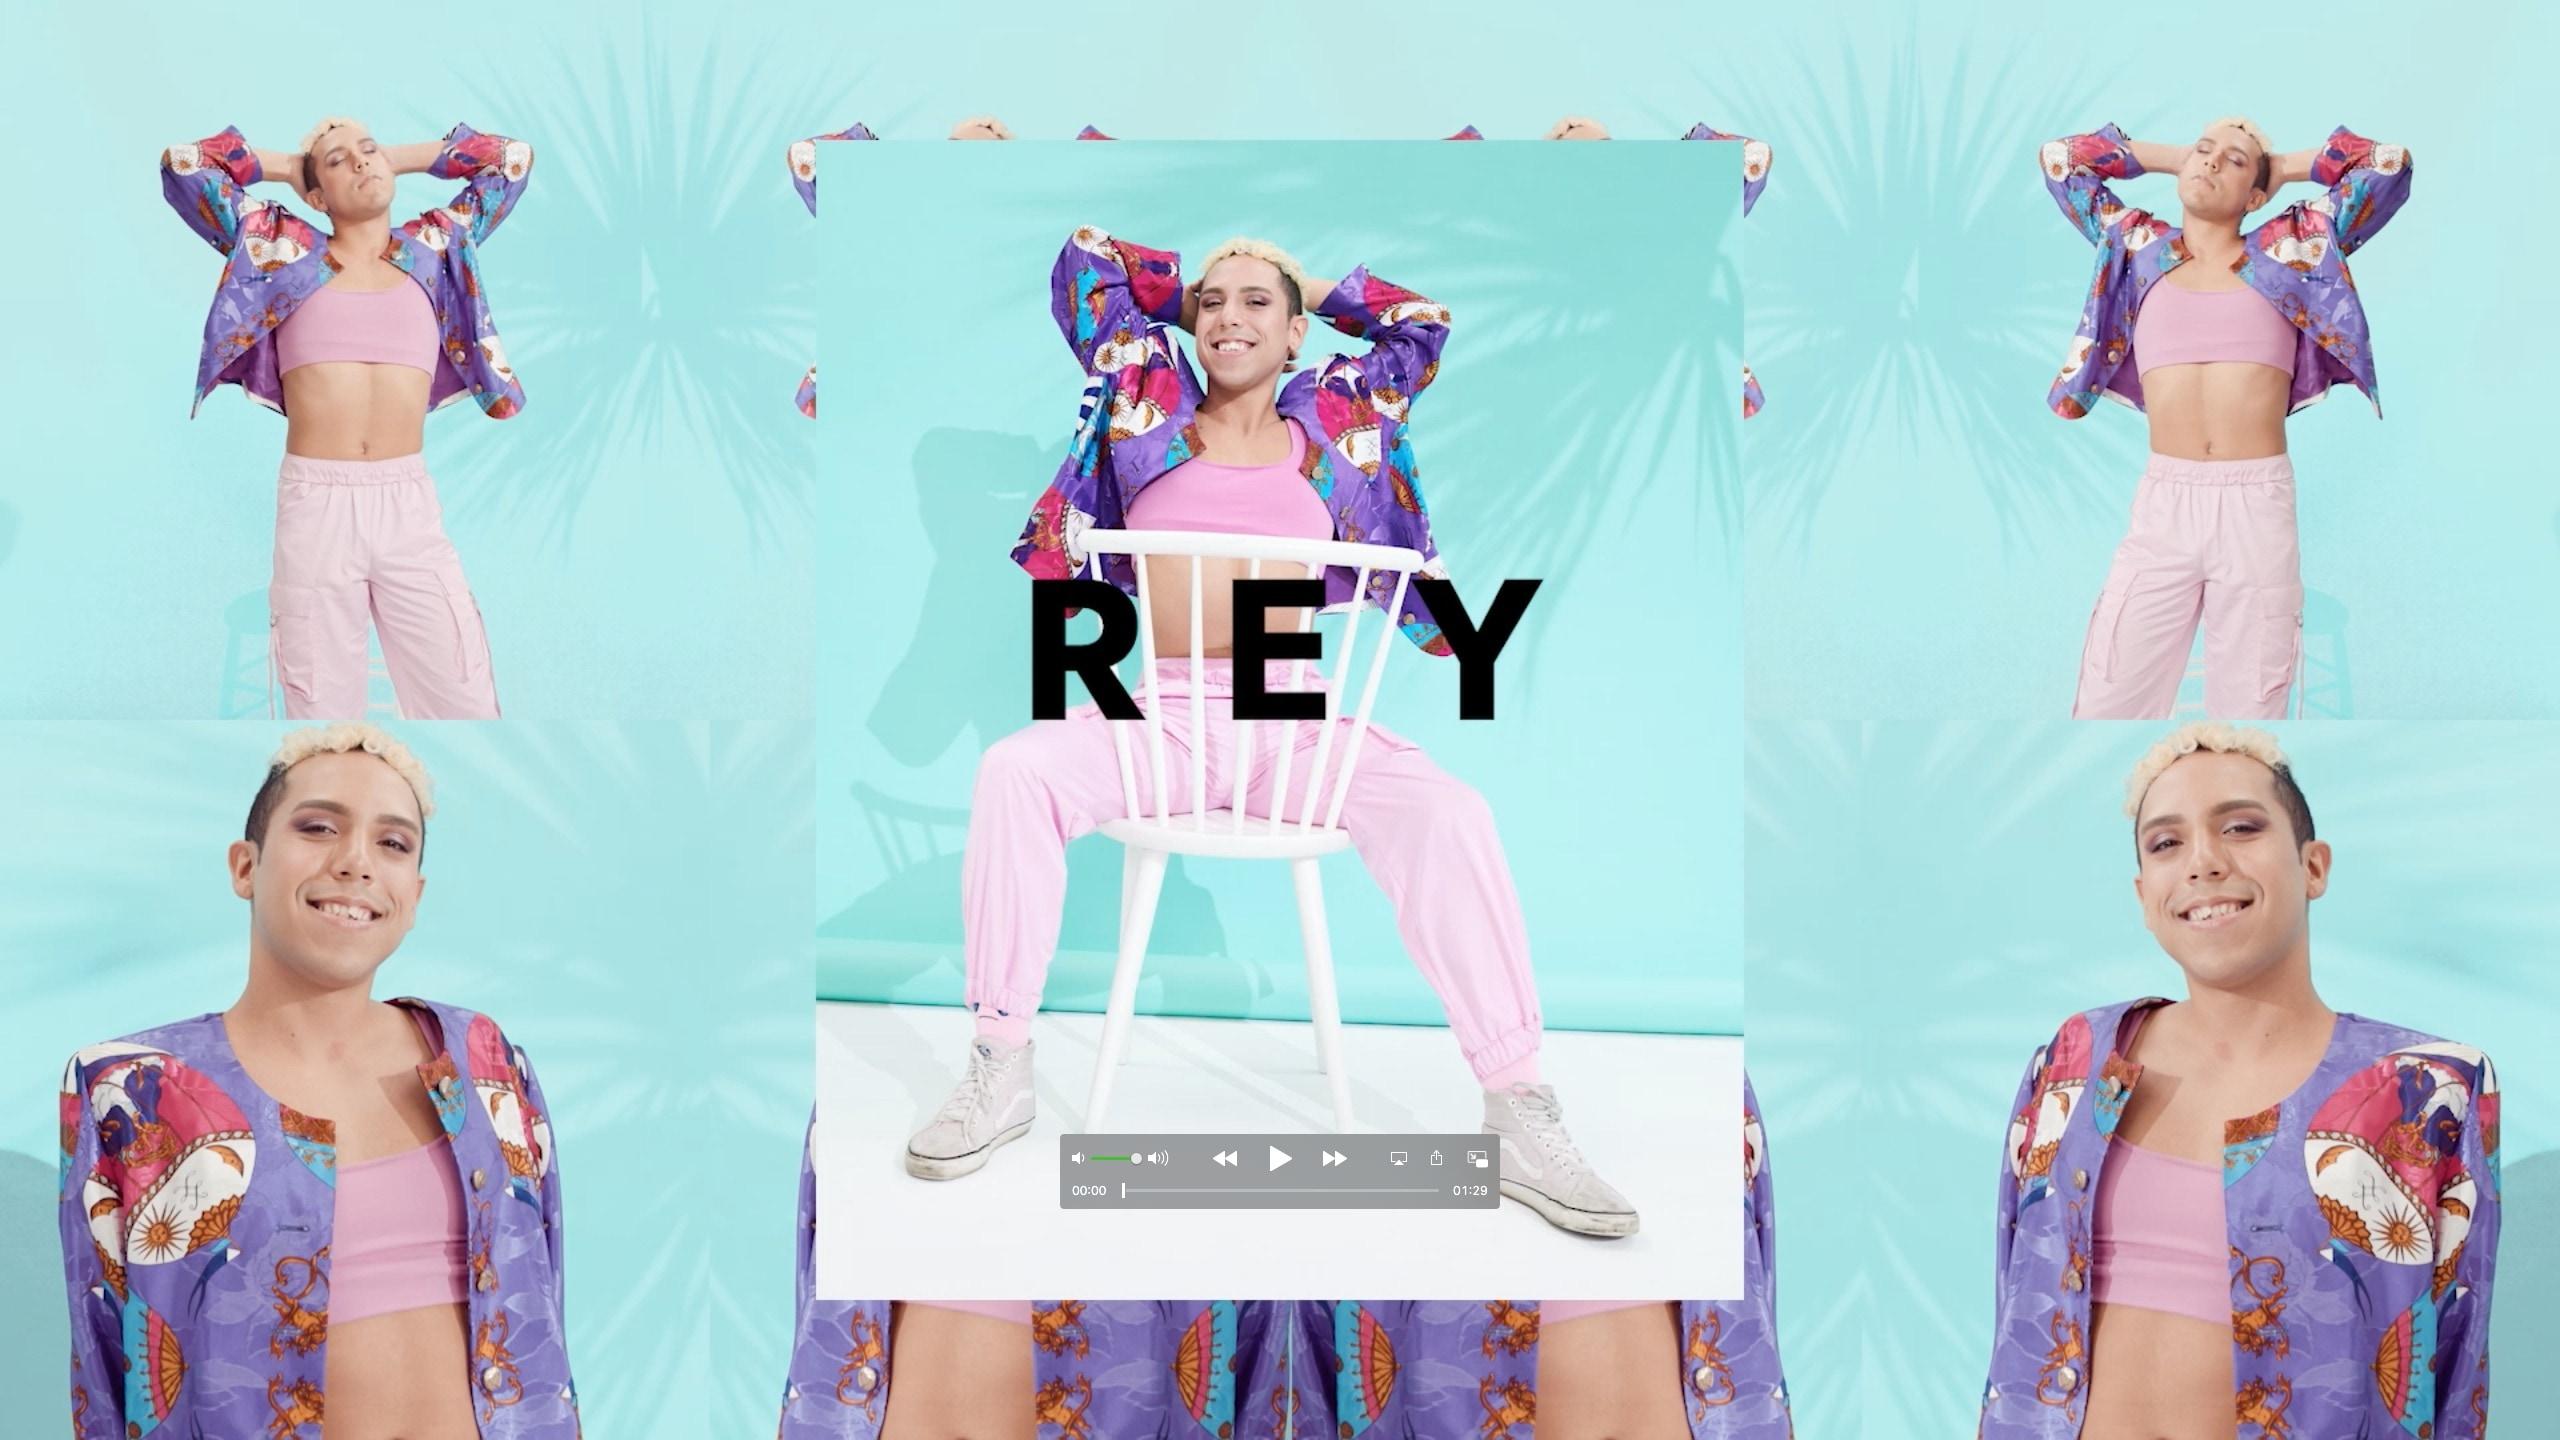 Watch Rey discuss Hispanic Heritage Month